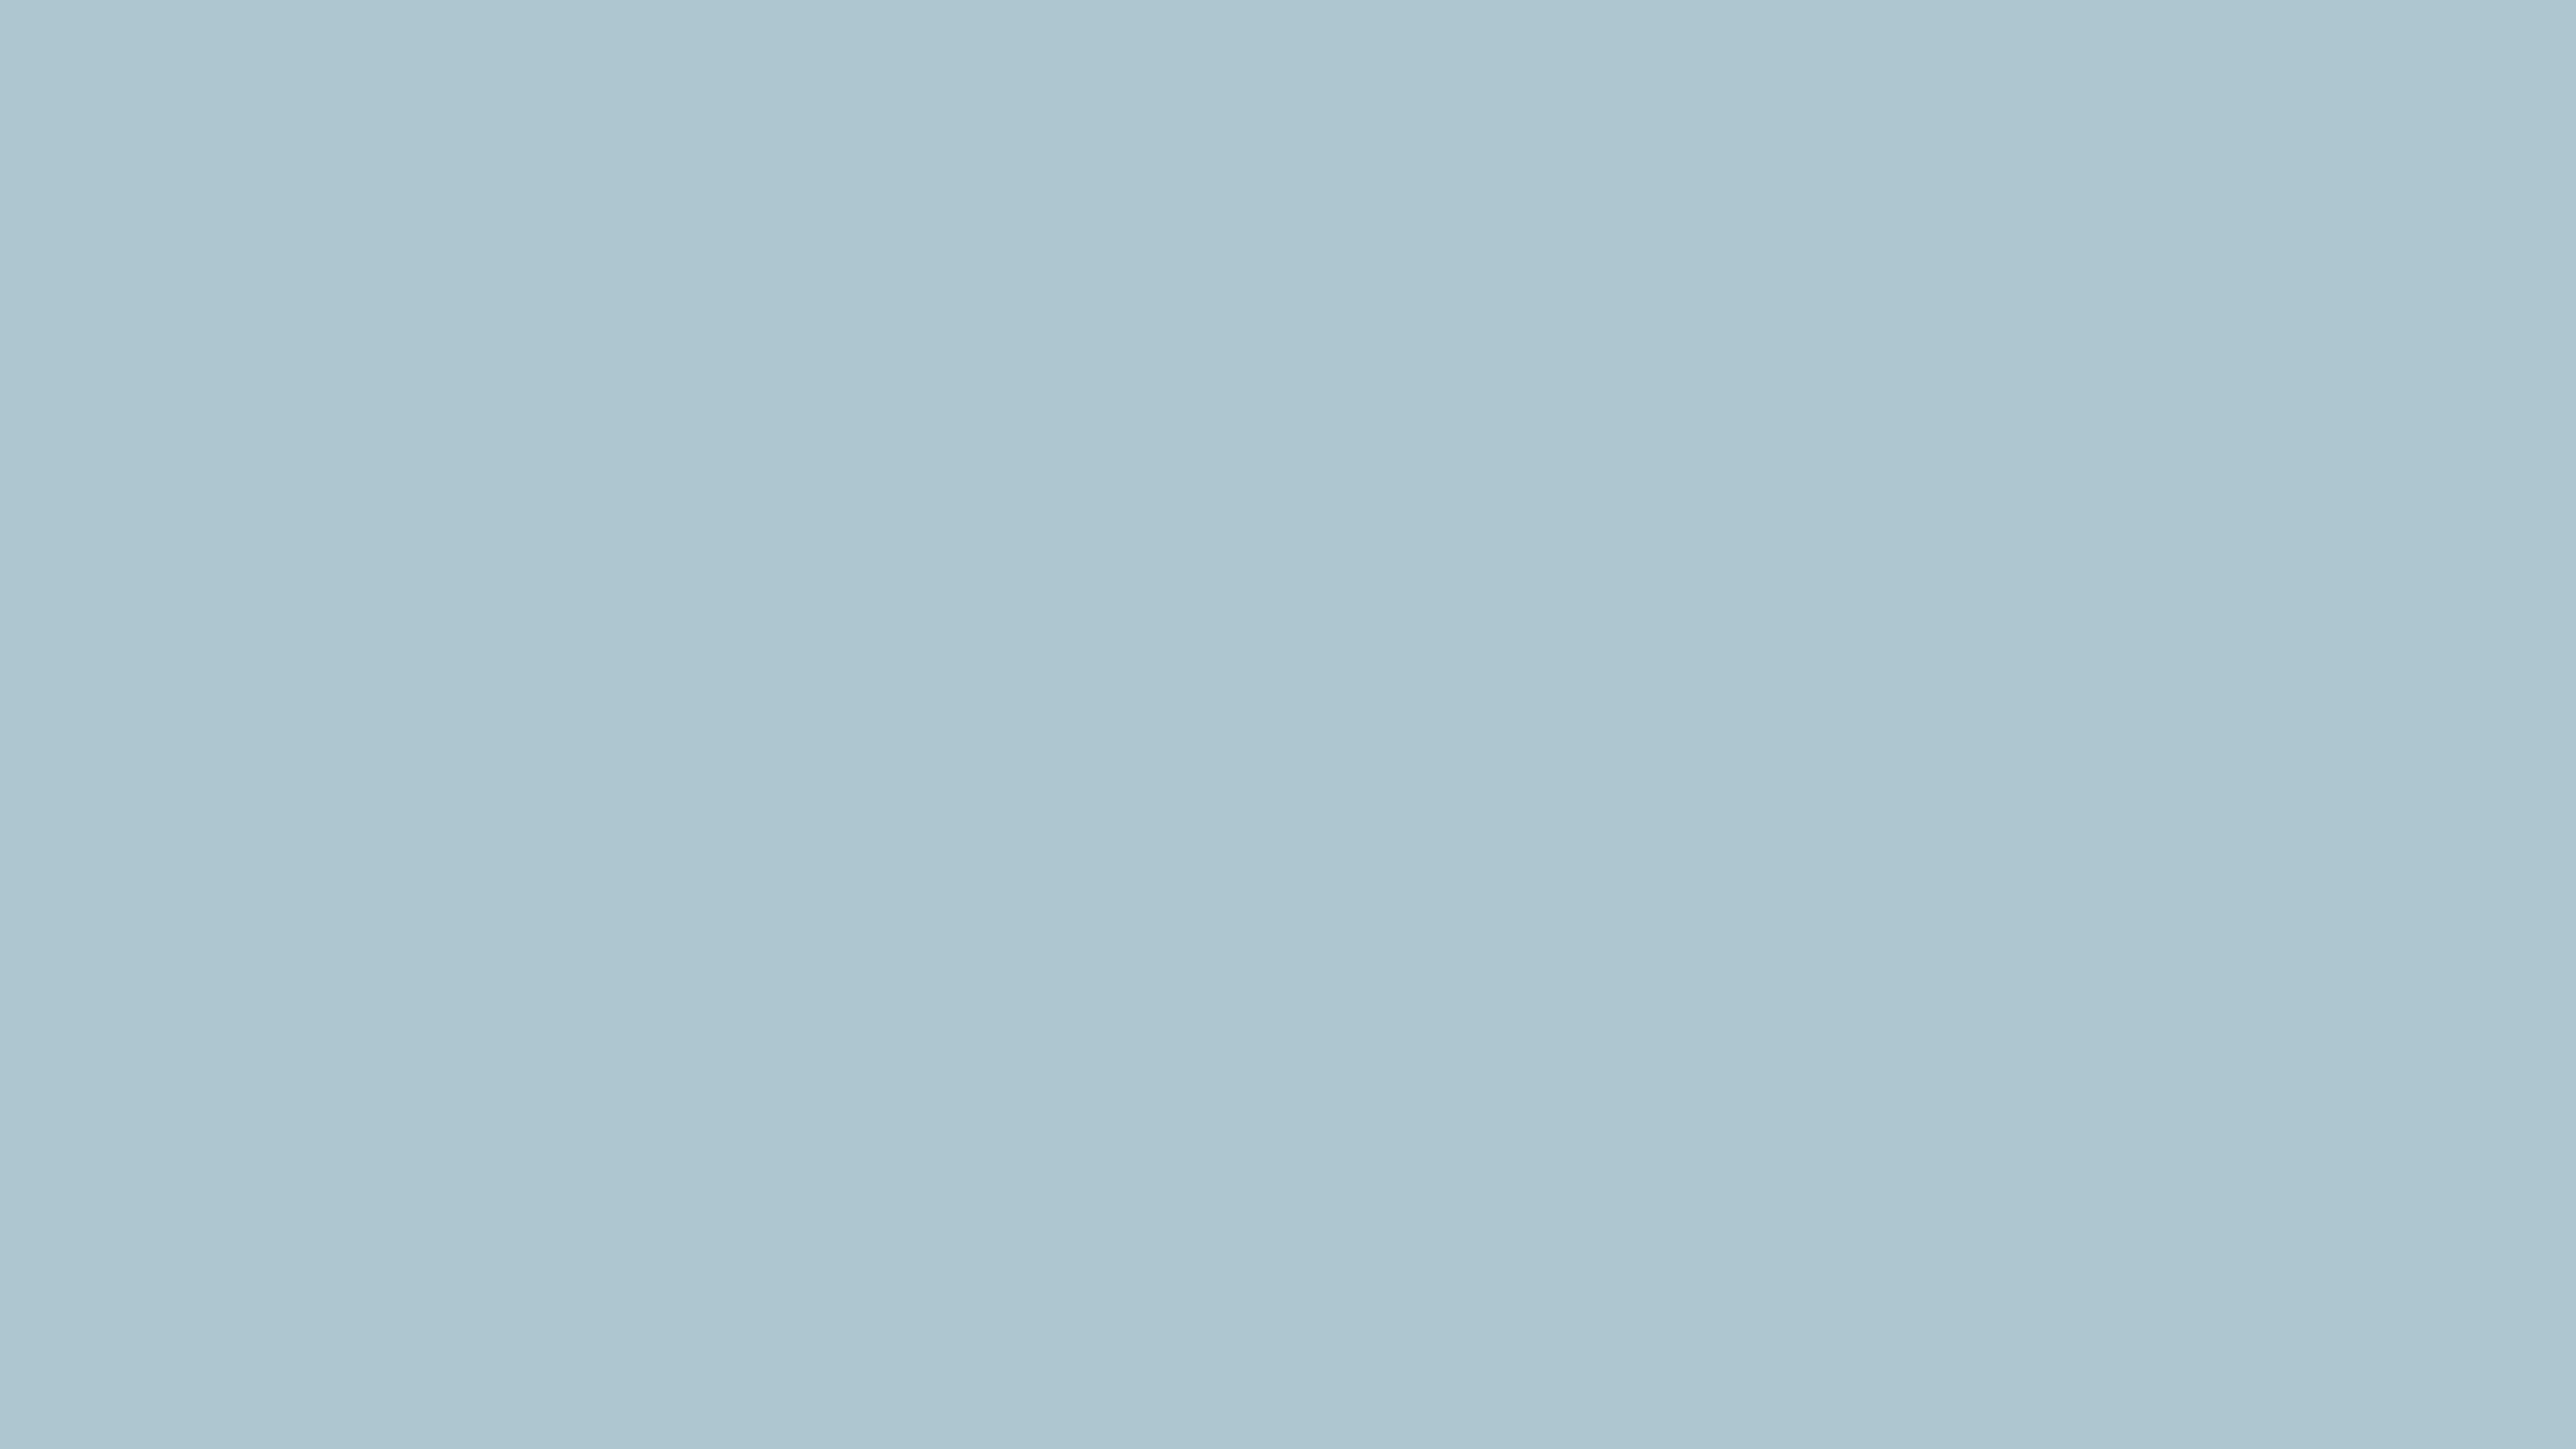 4096x2304 Pastel Blue Solid Color Background